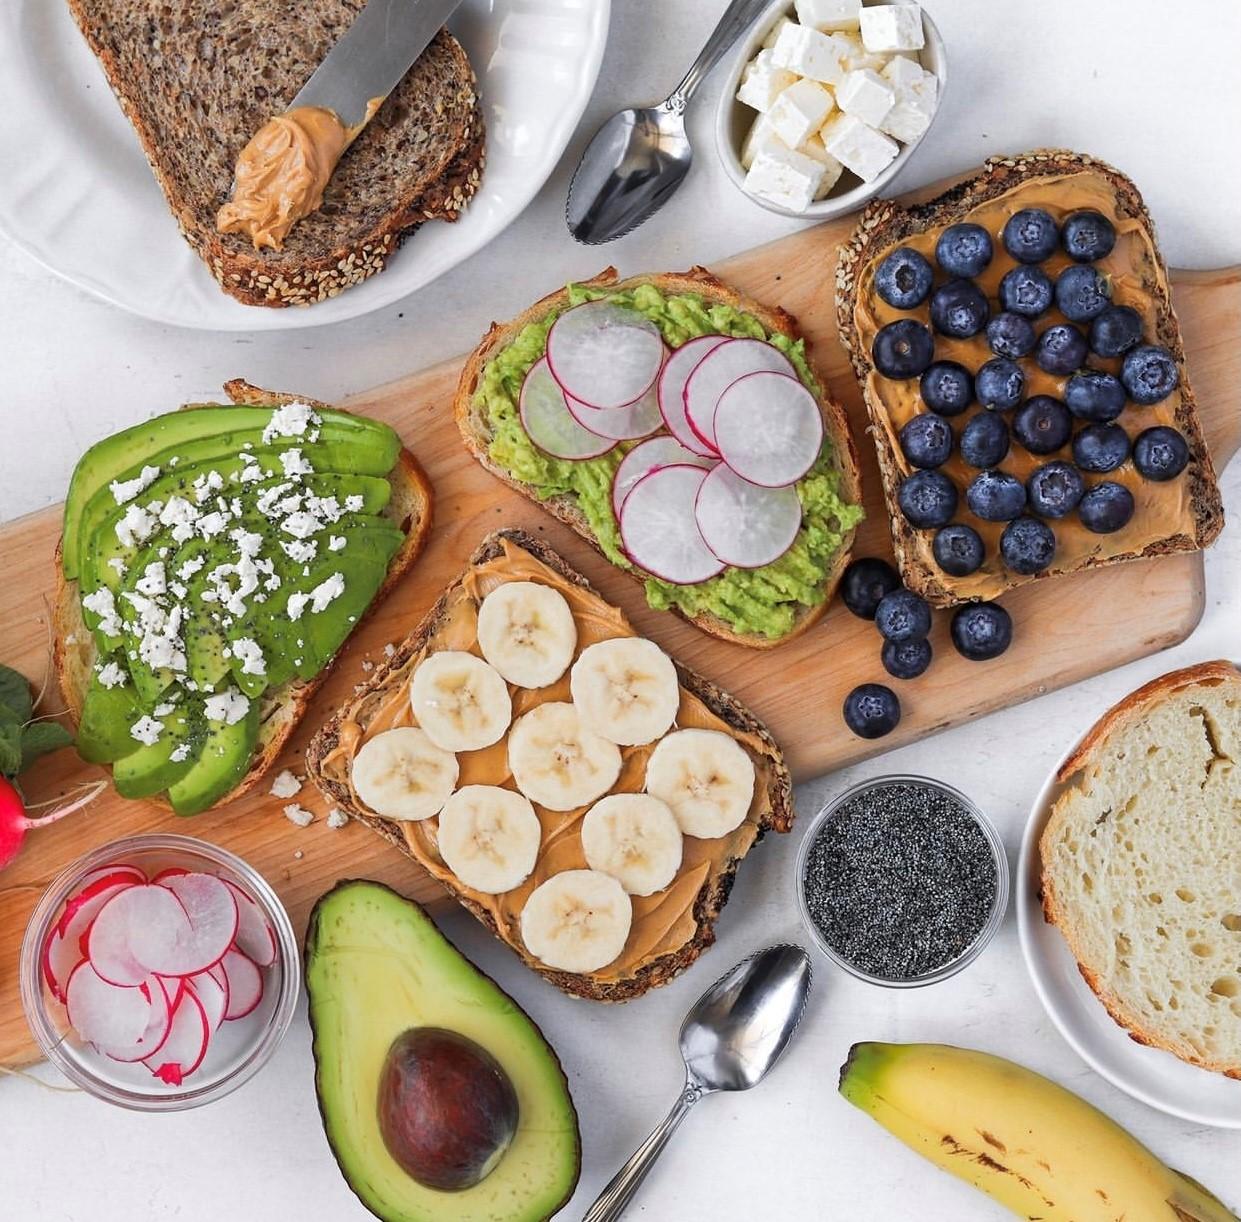 Avocado toast, banana and peanut butter toast, peanut butter and blueberry toast